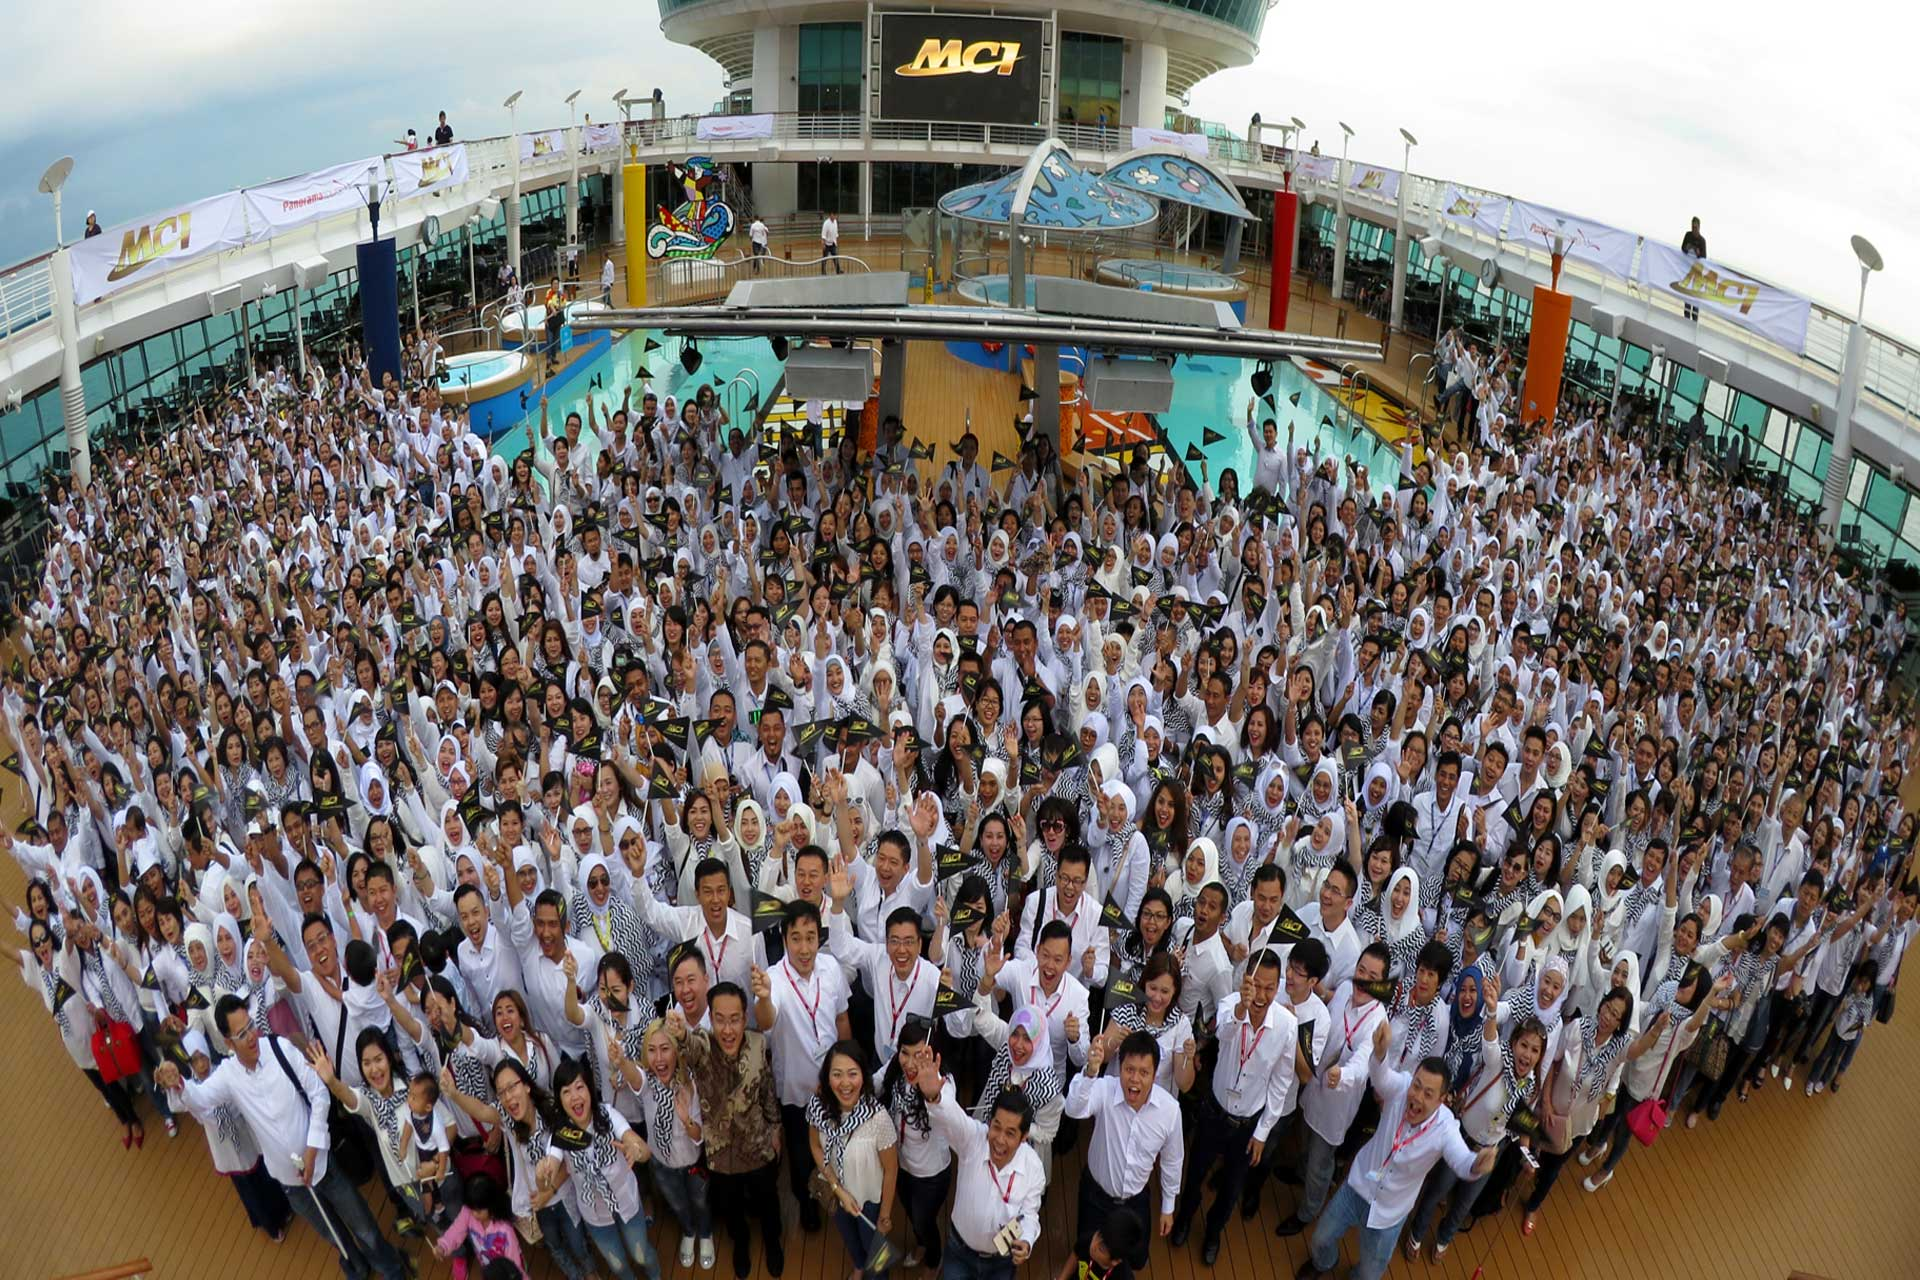 MCI Cruise Tour